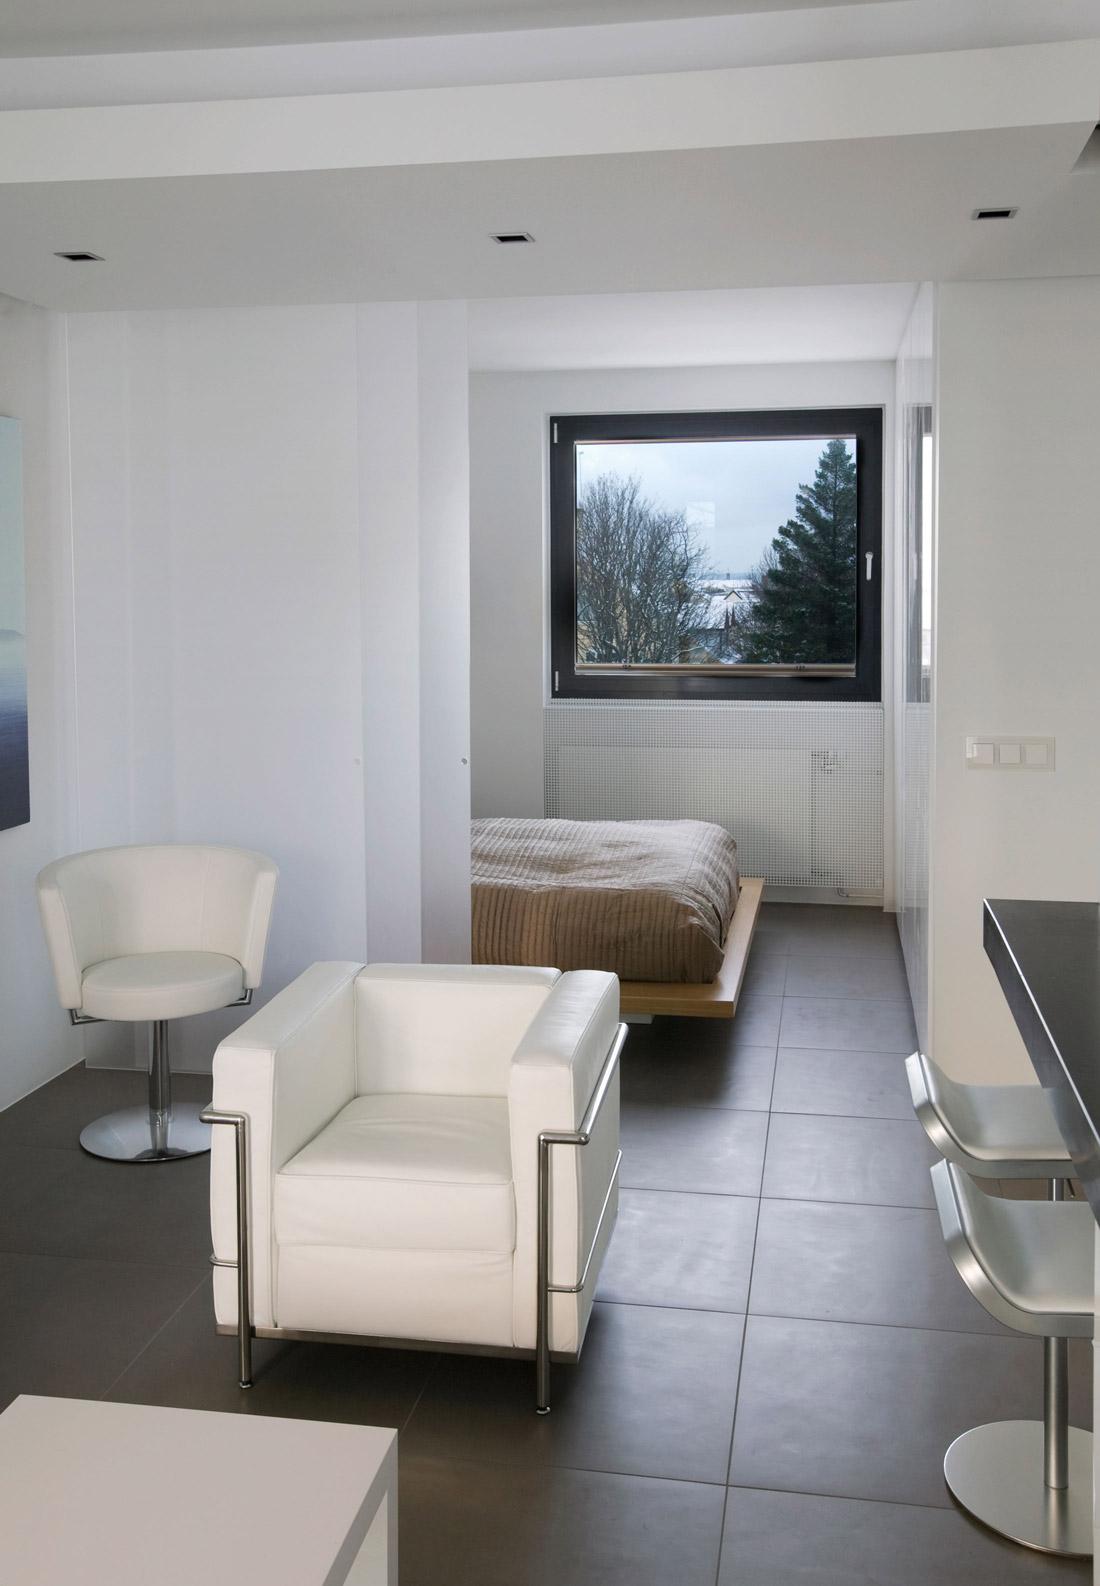 Bedroom, Living Space, Modern Apartment in Reykjavik, Iceland